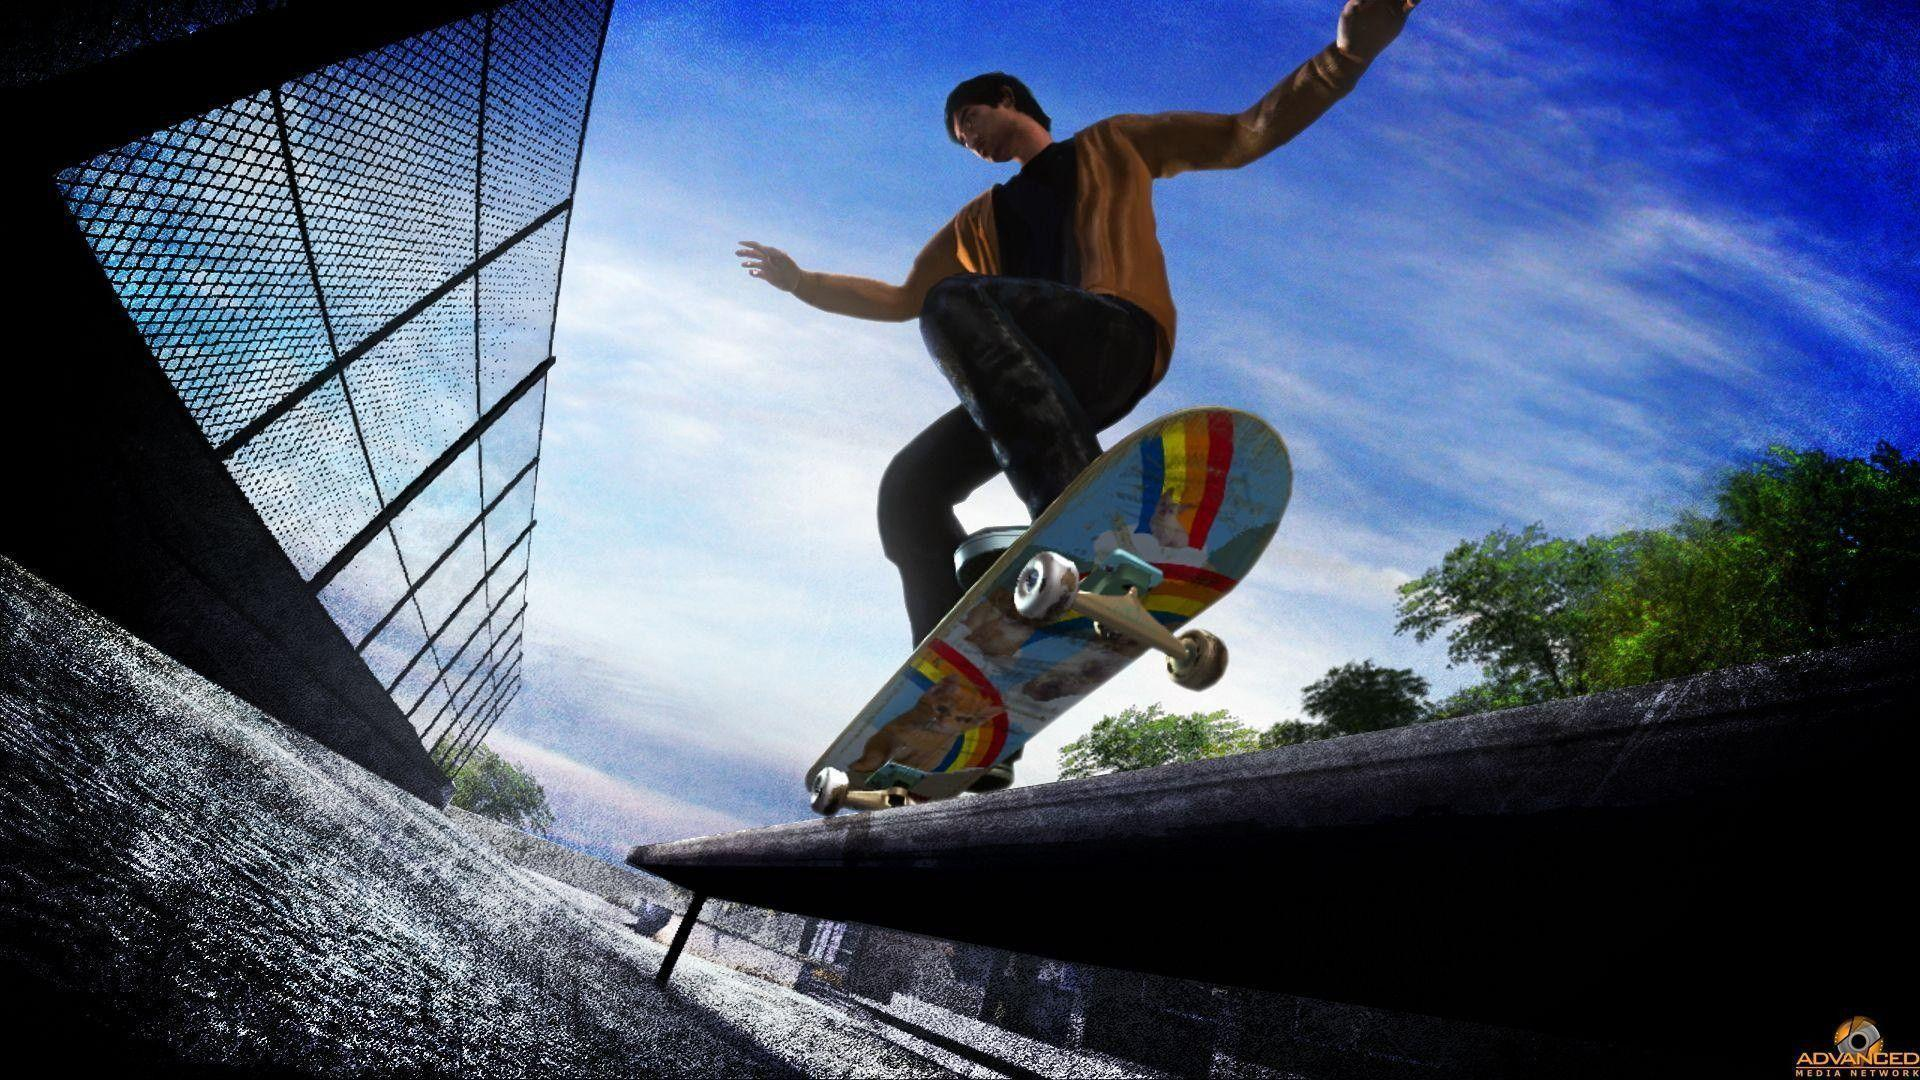 Skate 3 Wallpapers - WallpaperPulse